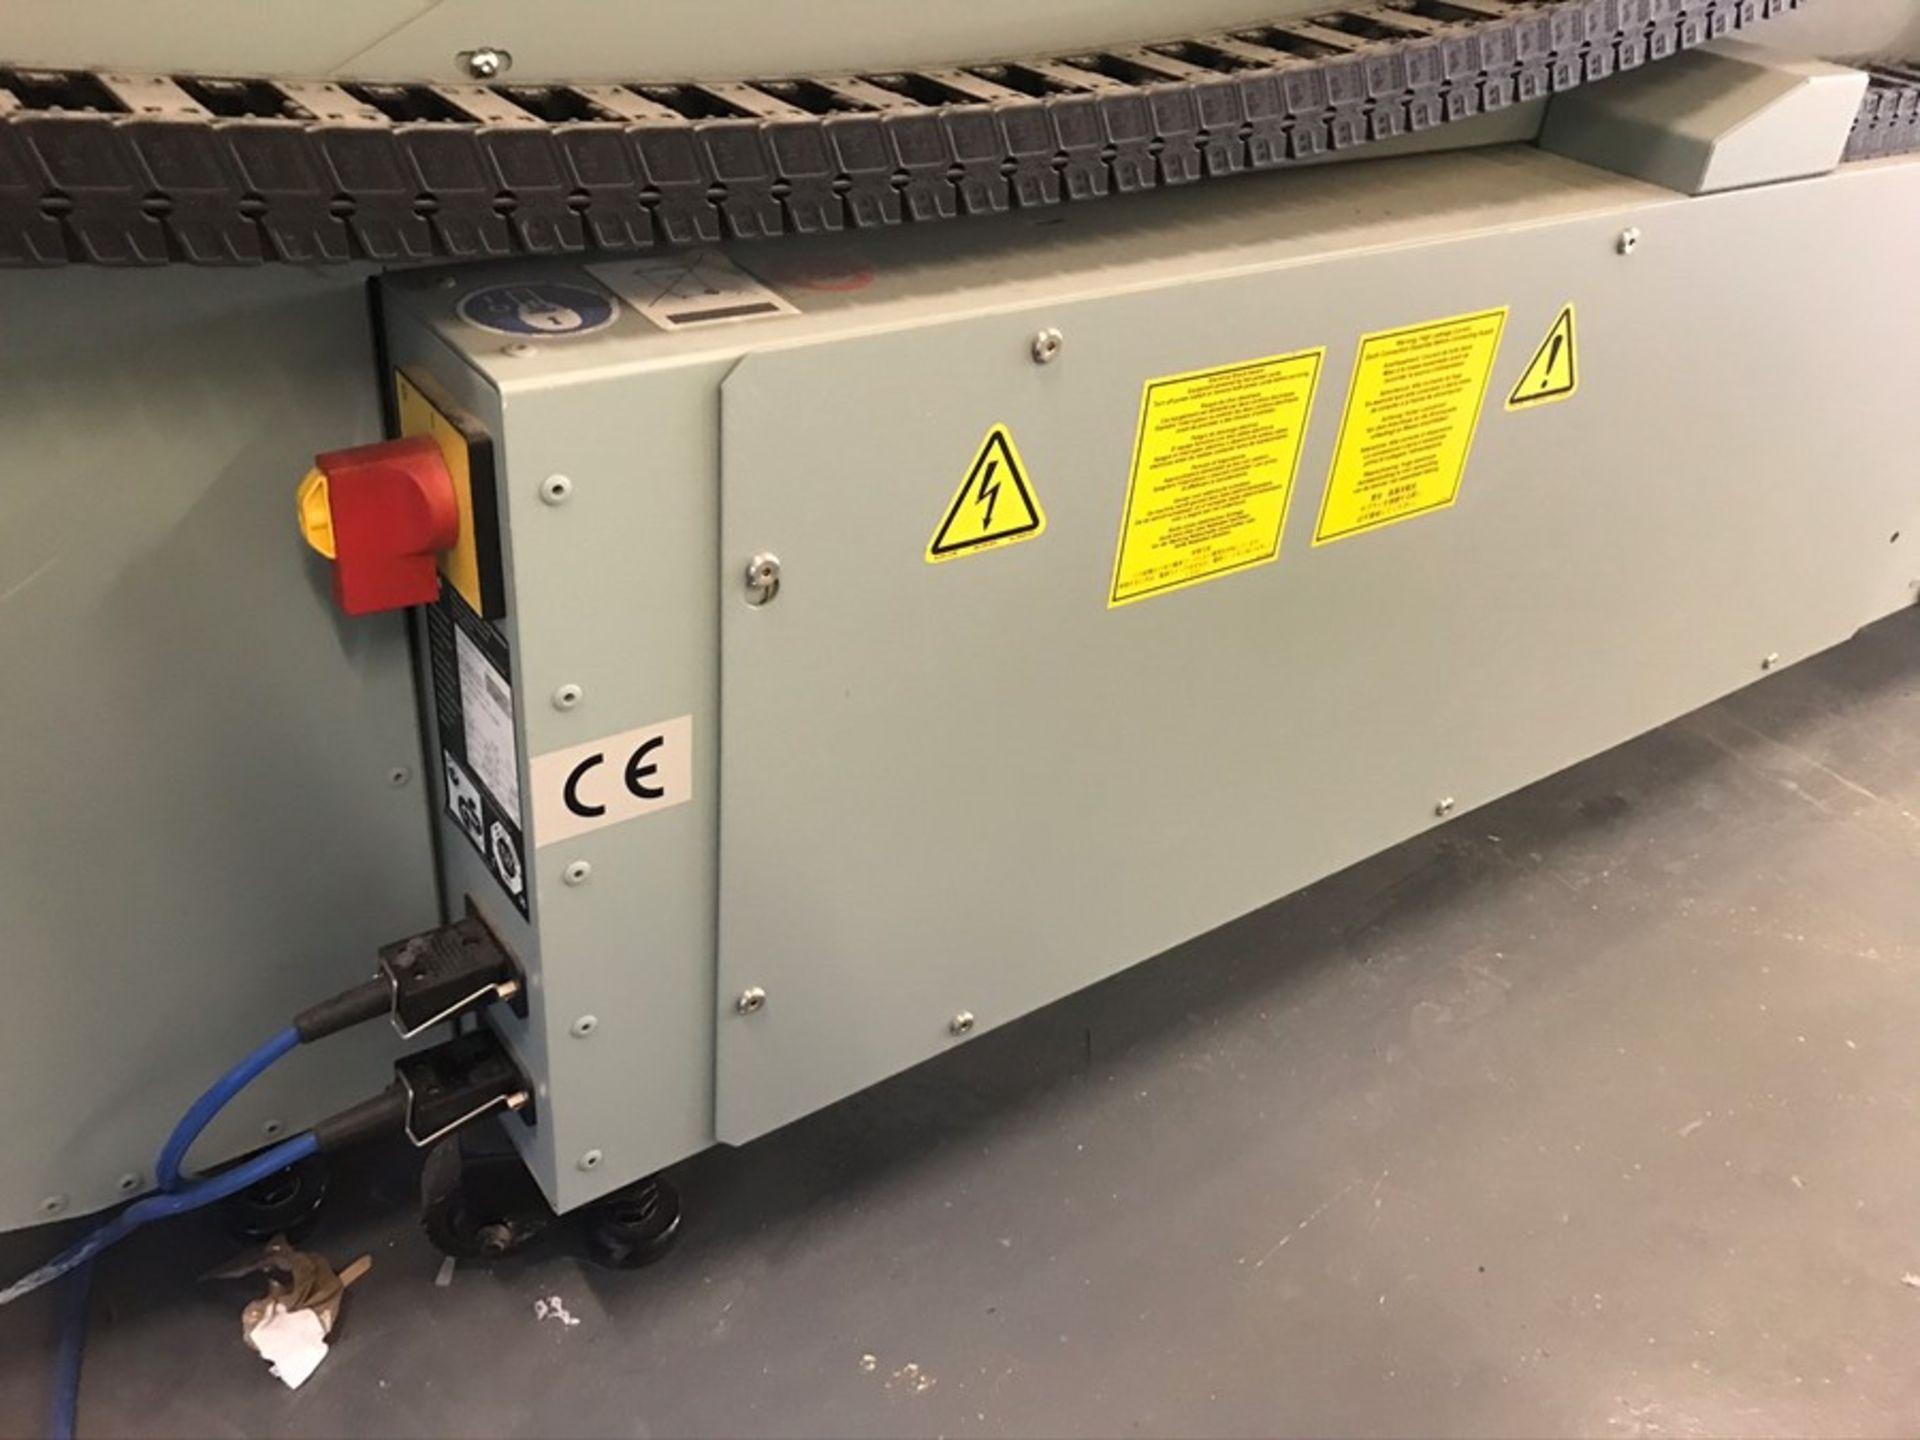 Oce Arizona 550XT + WIO UV flatbed printer (2013) - Image 13 of 22